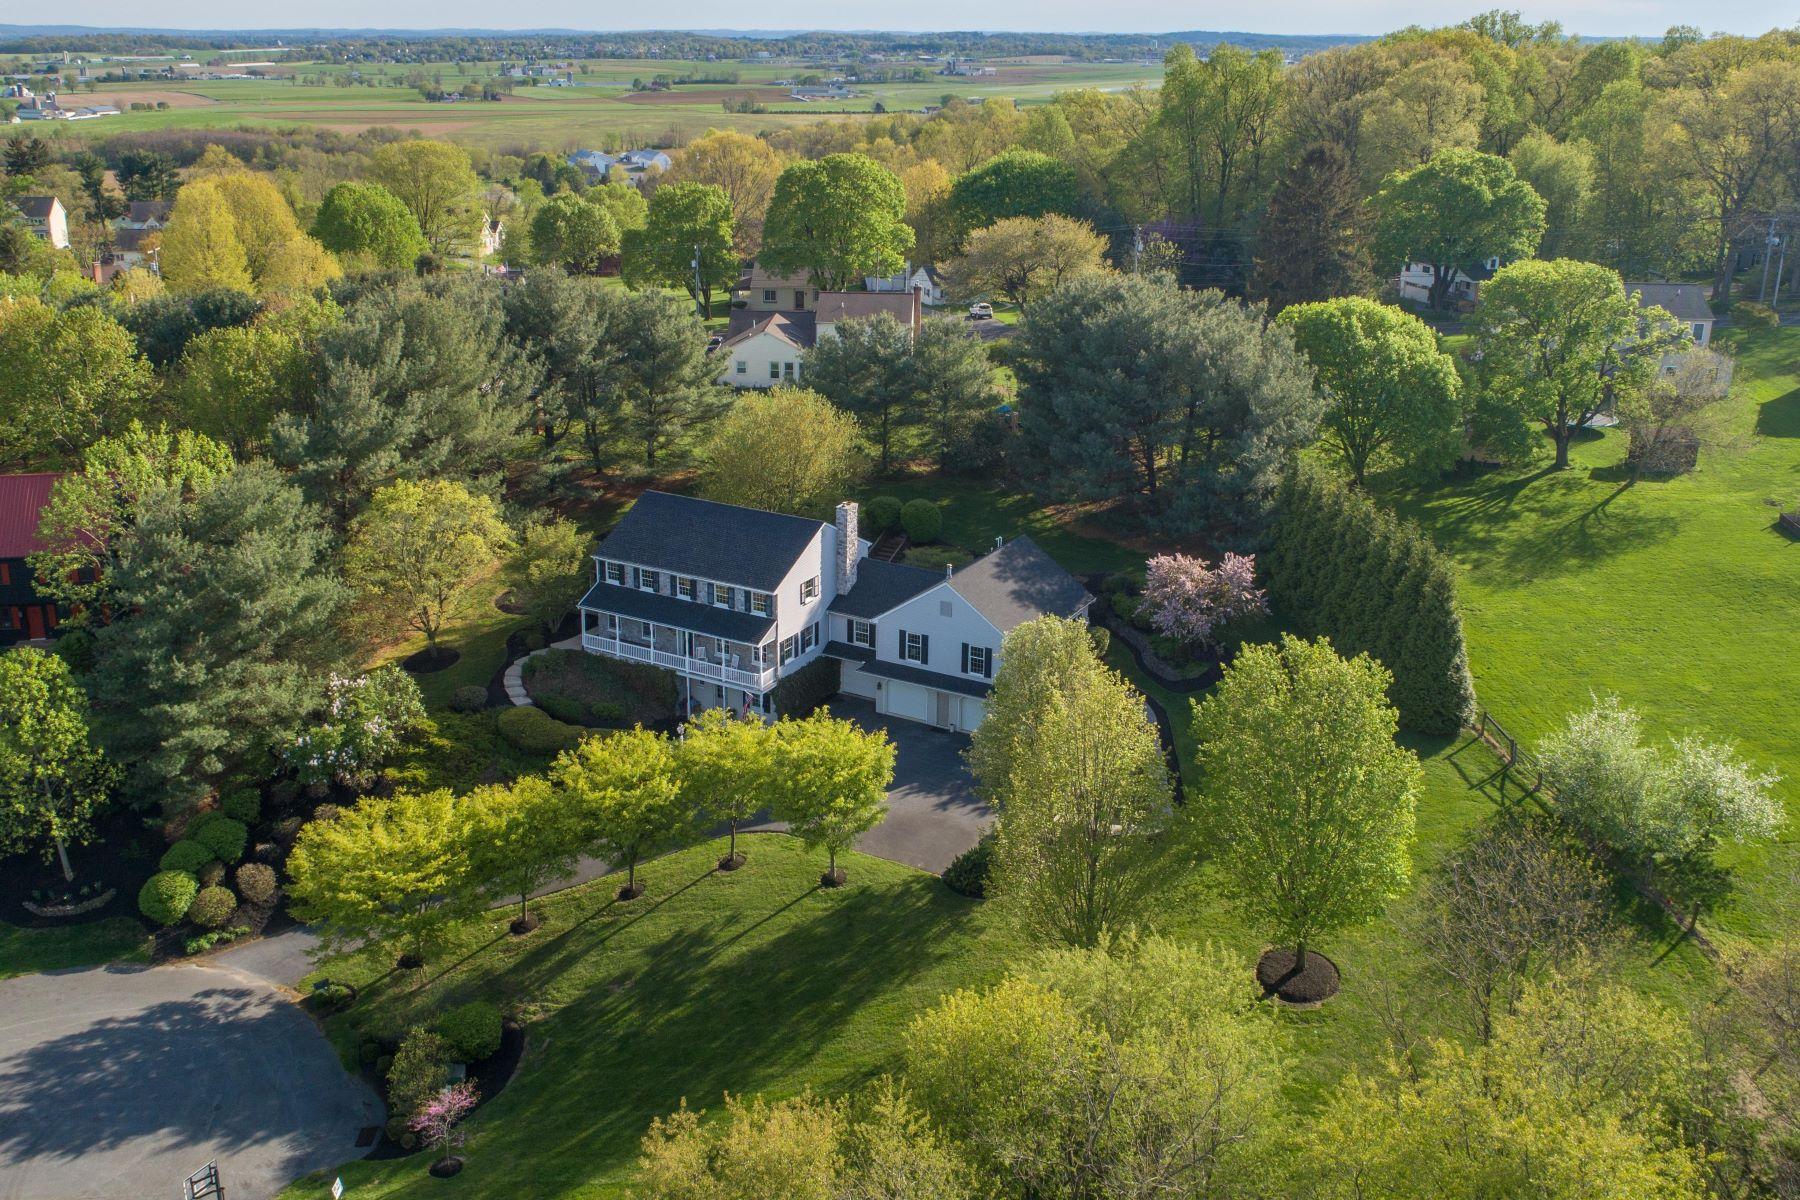 Single Family Homes for Sale at 29 Ridge Road Lititz, Pennsylvania 17543 United States